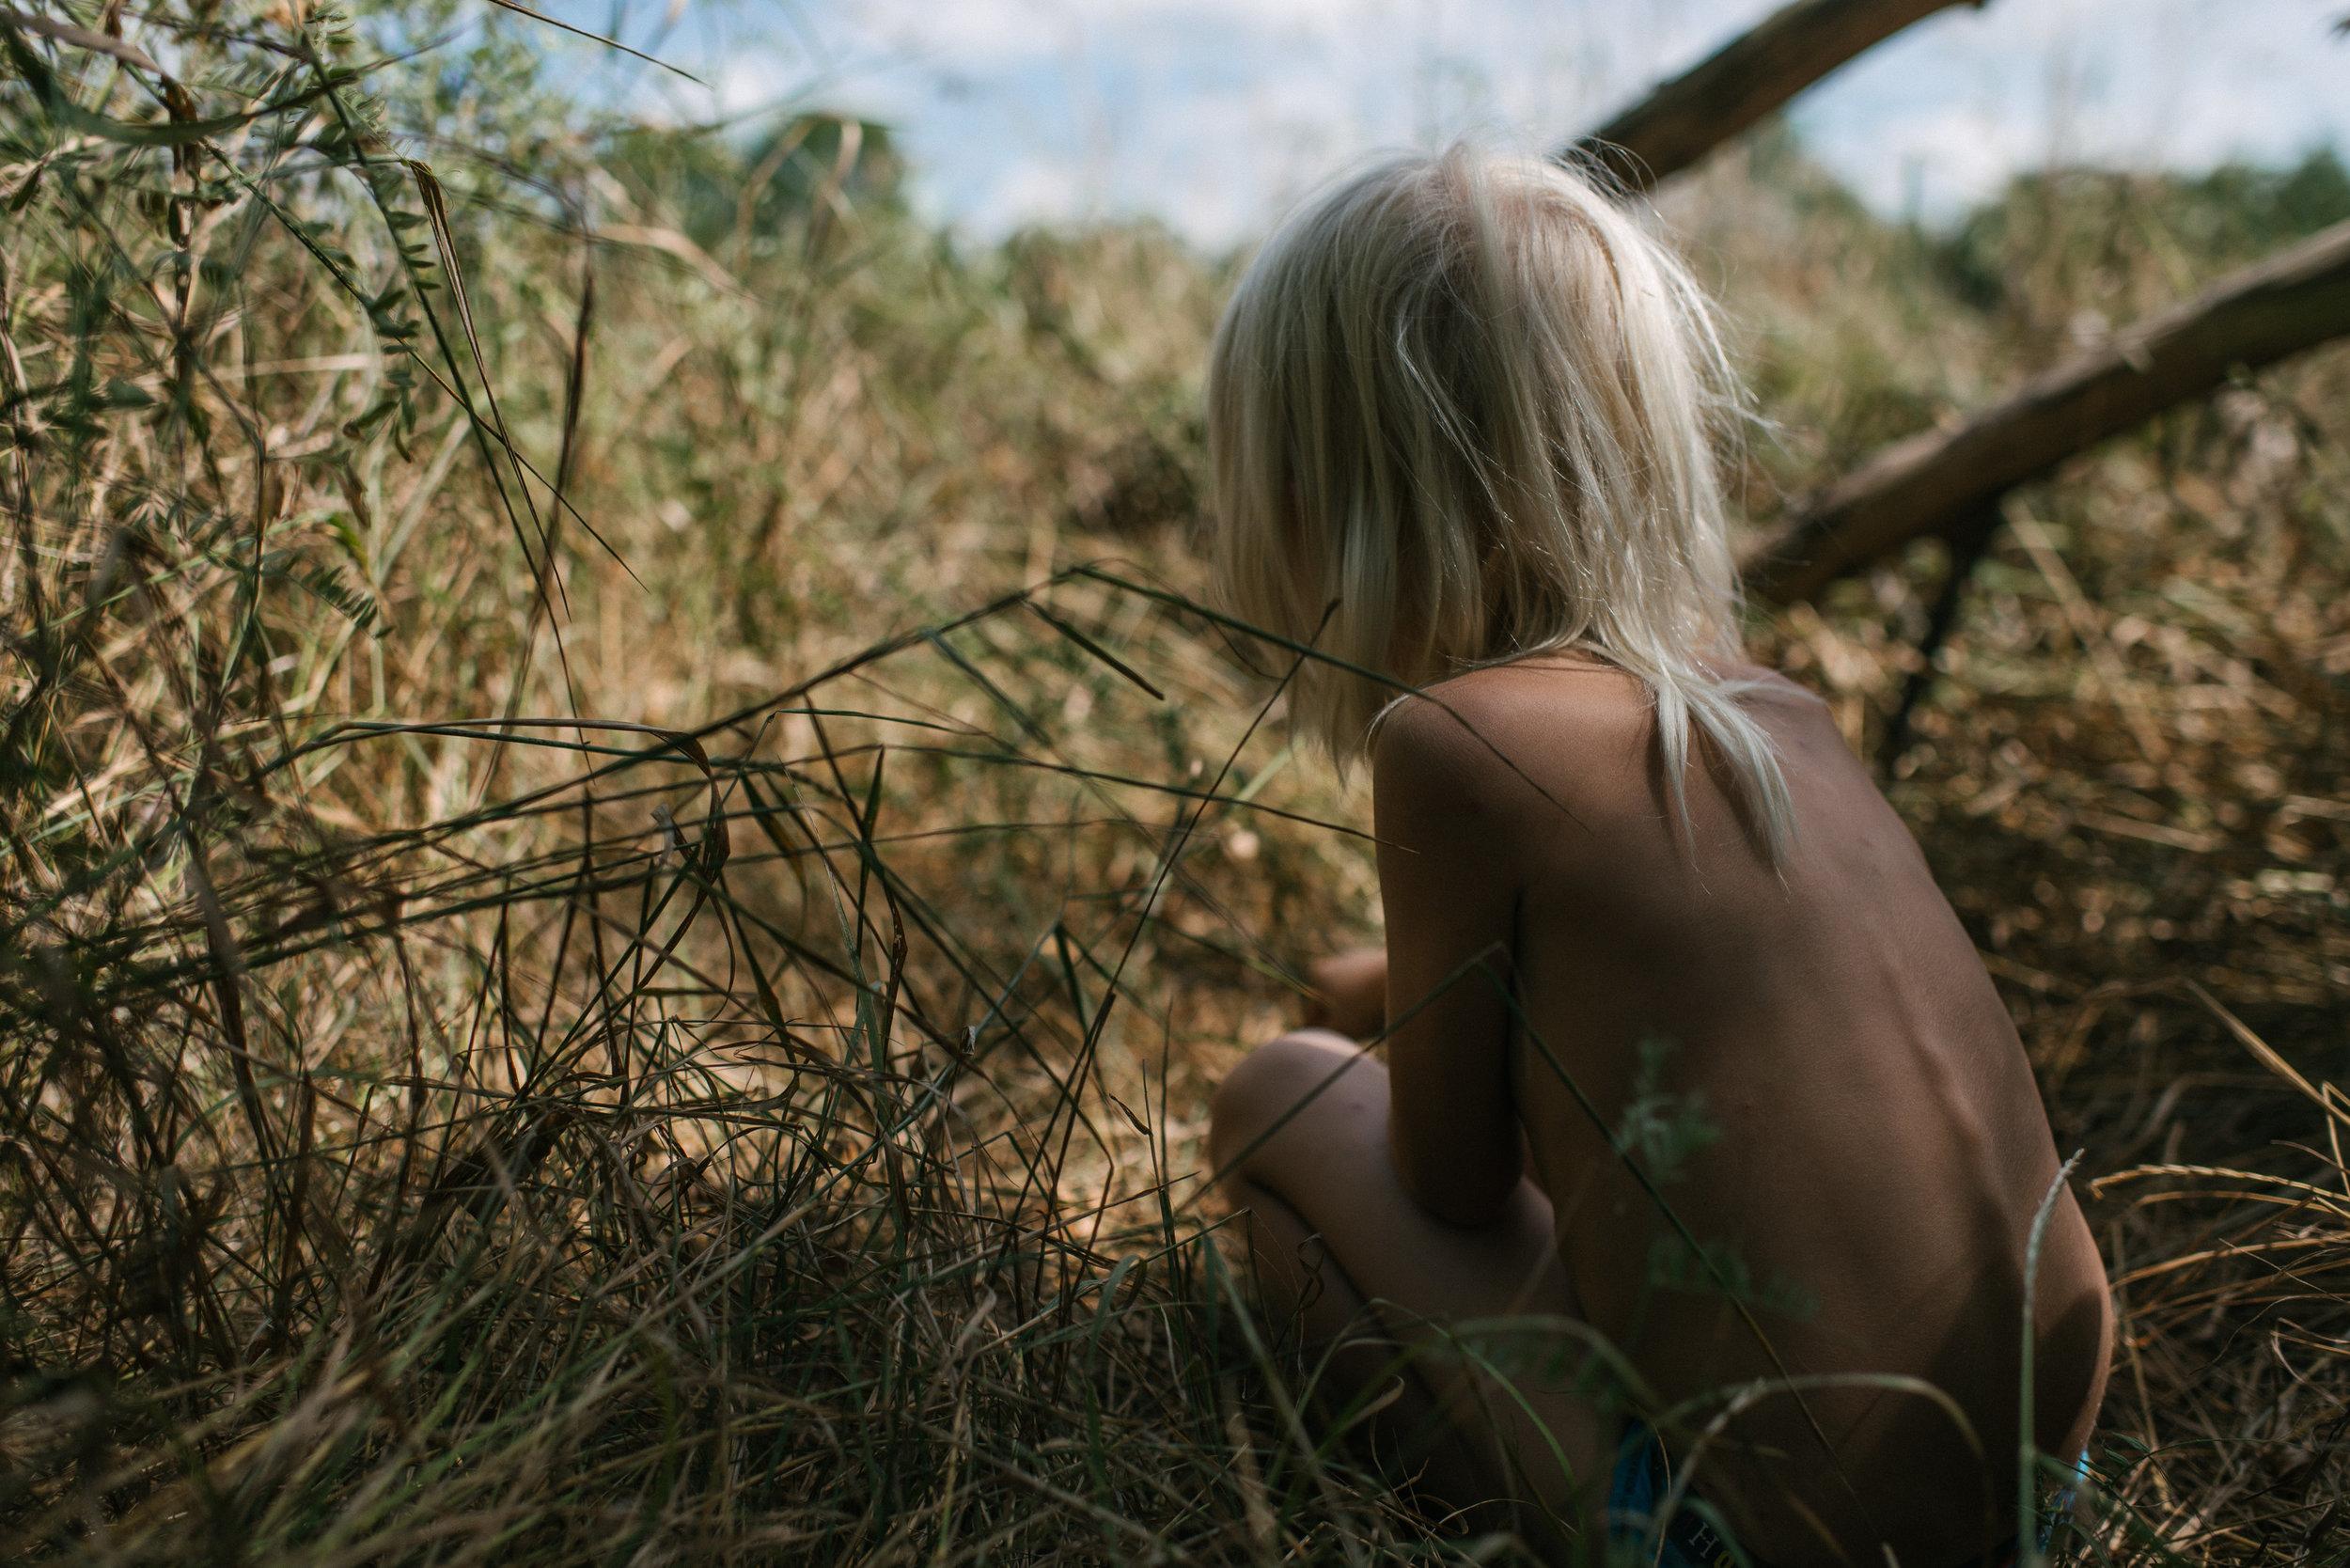 family documentary photography in kingston by viara mileva-145813vm.jpg